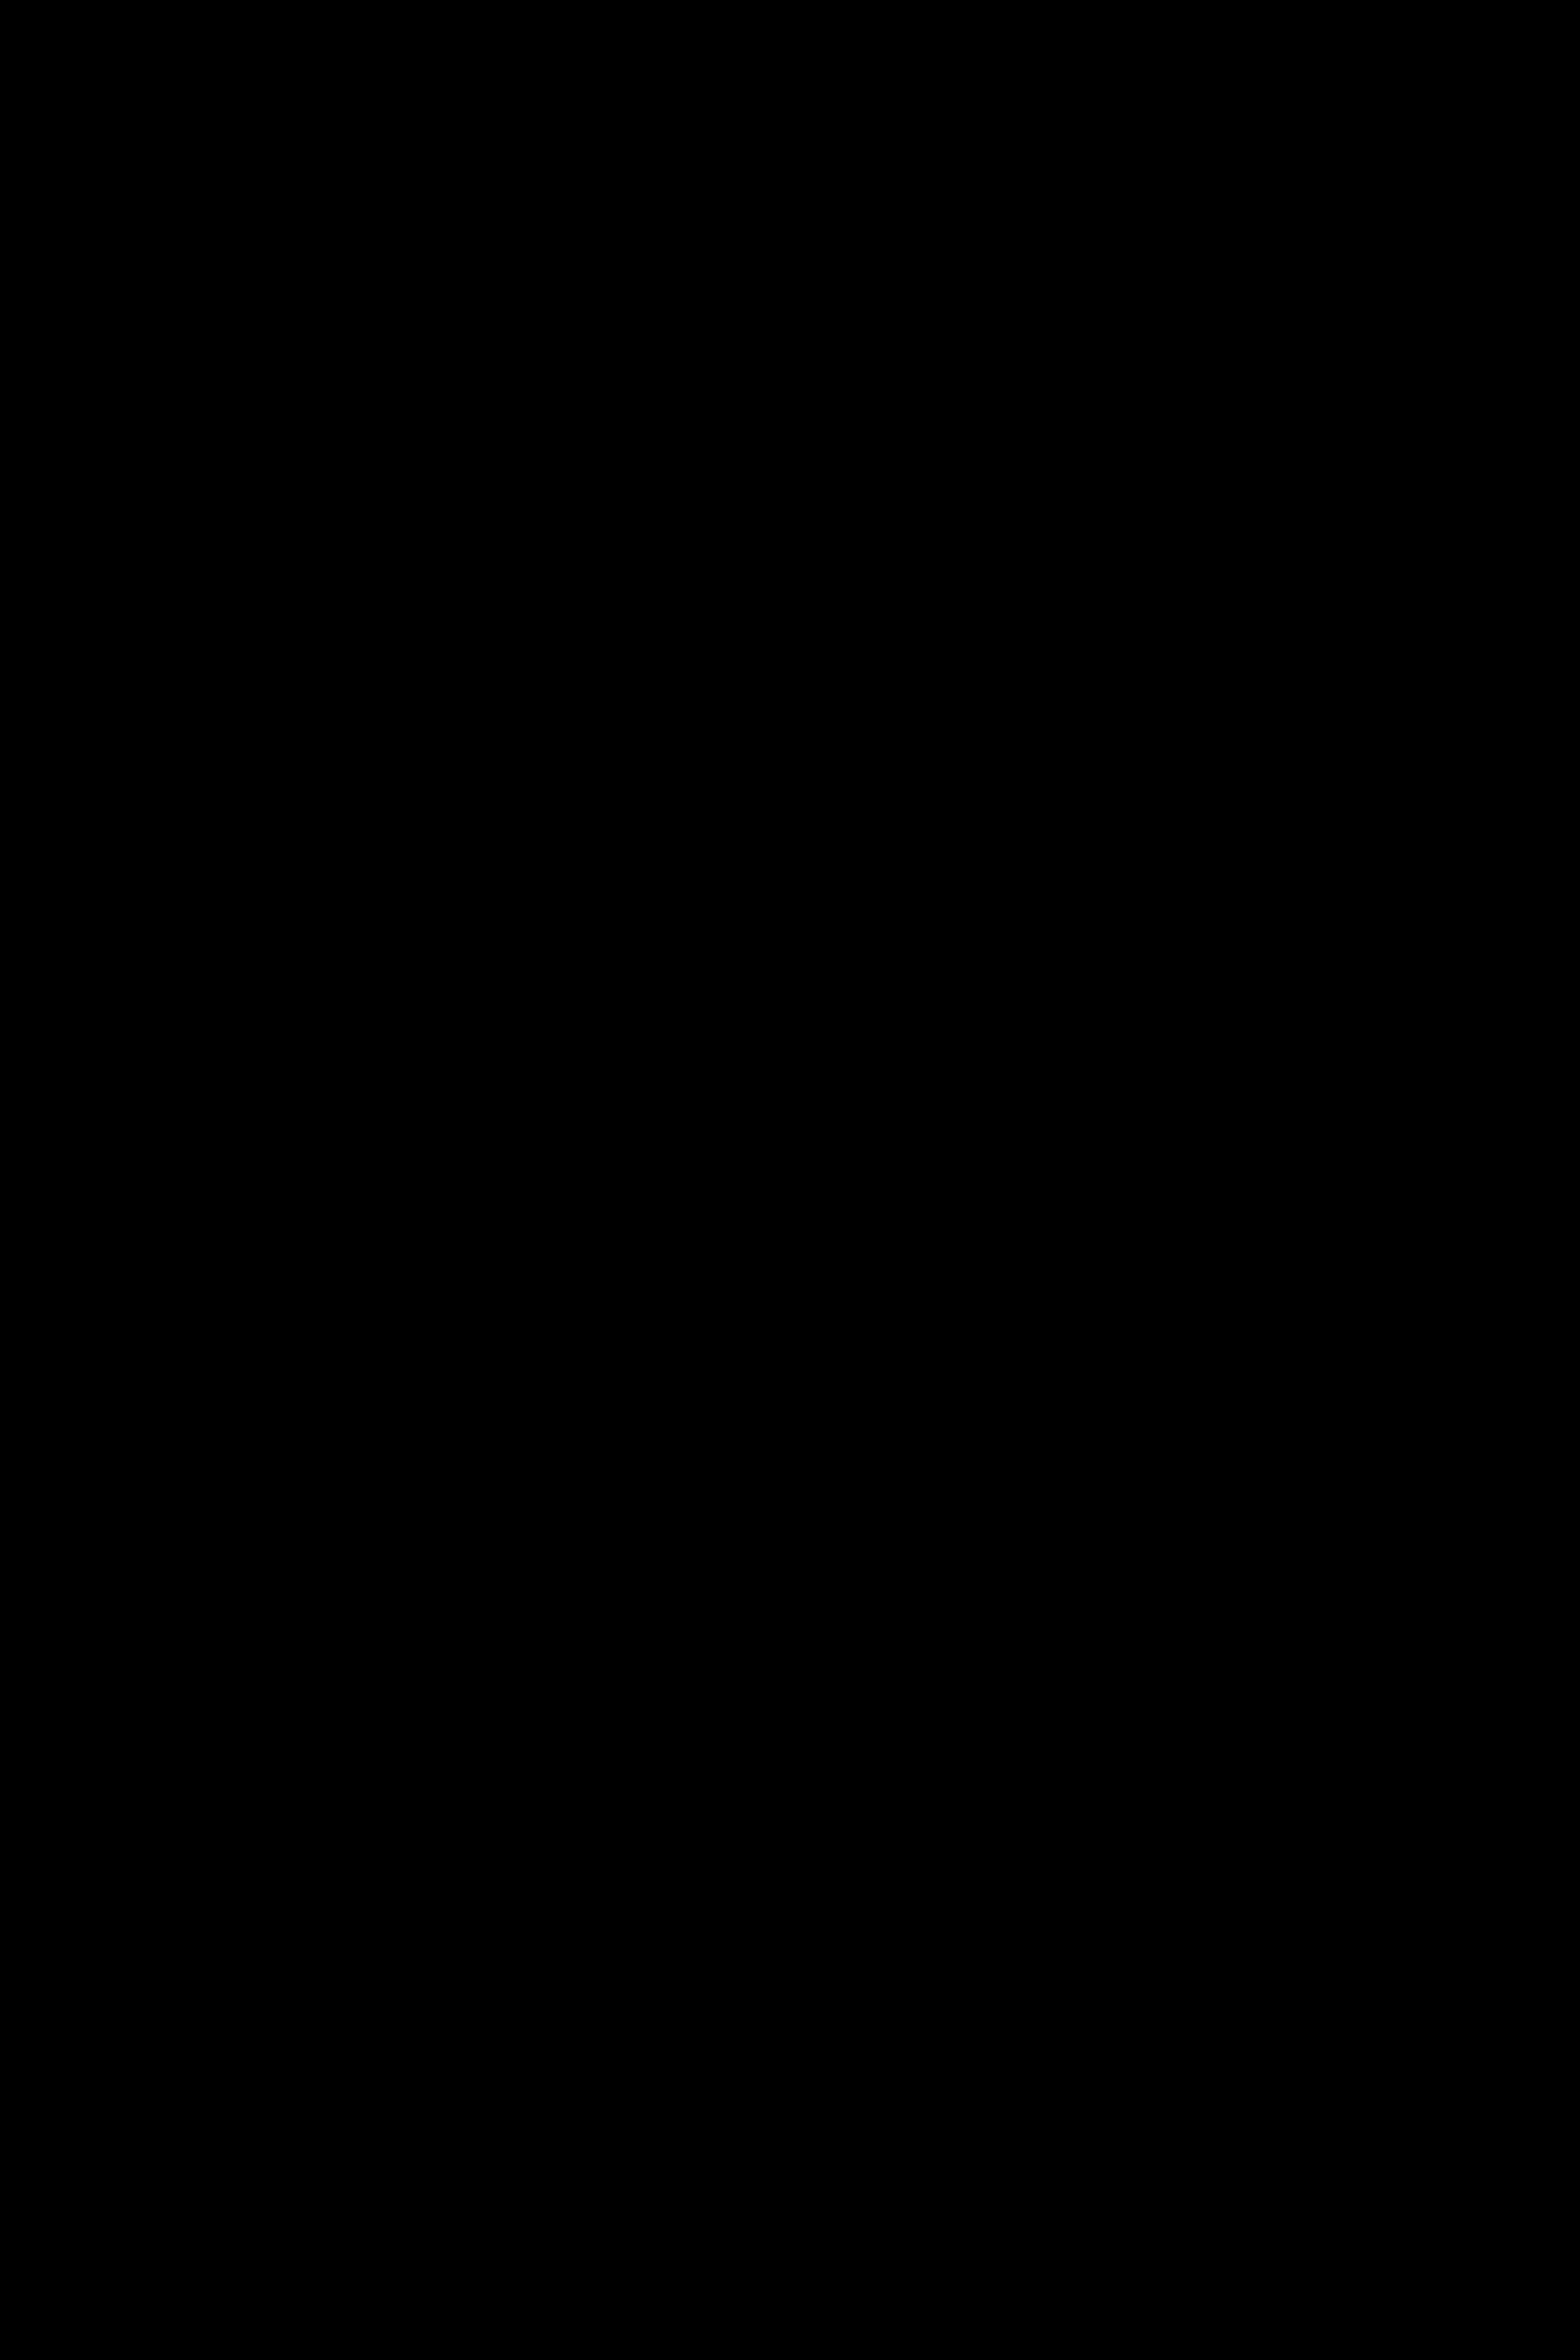 michellecarrigan